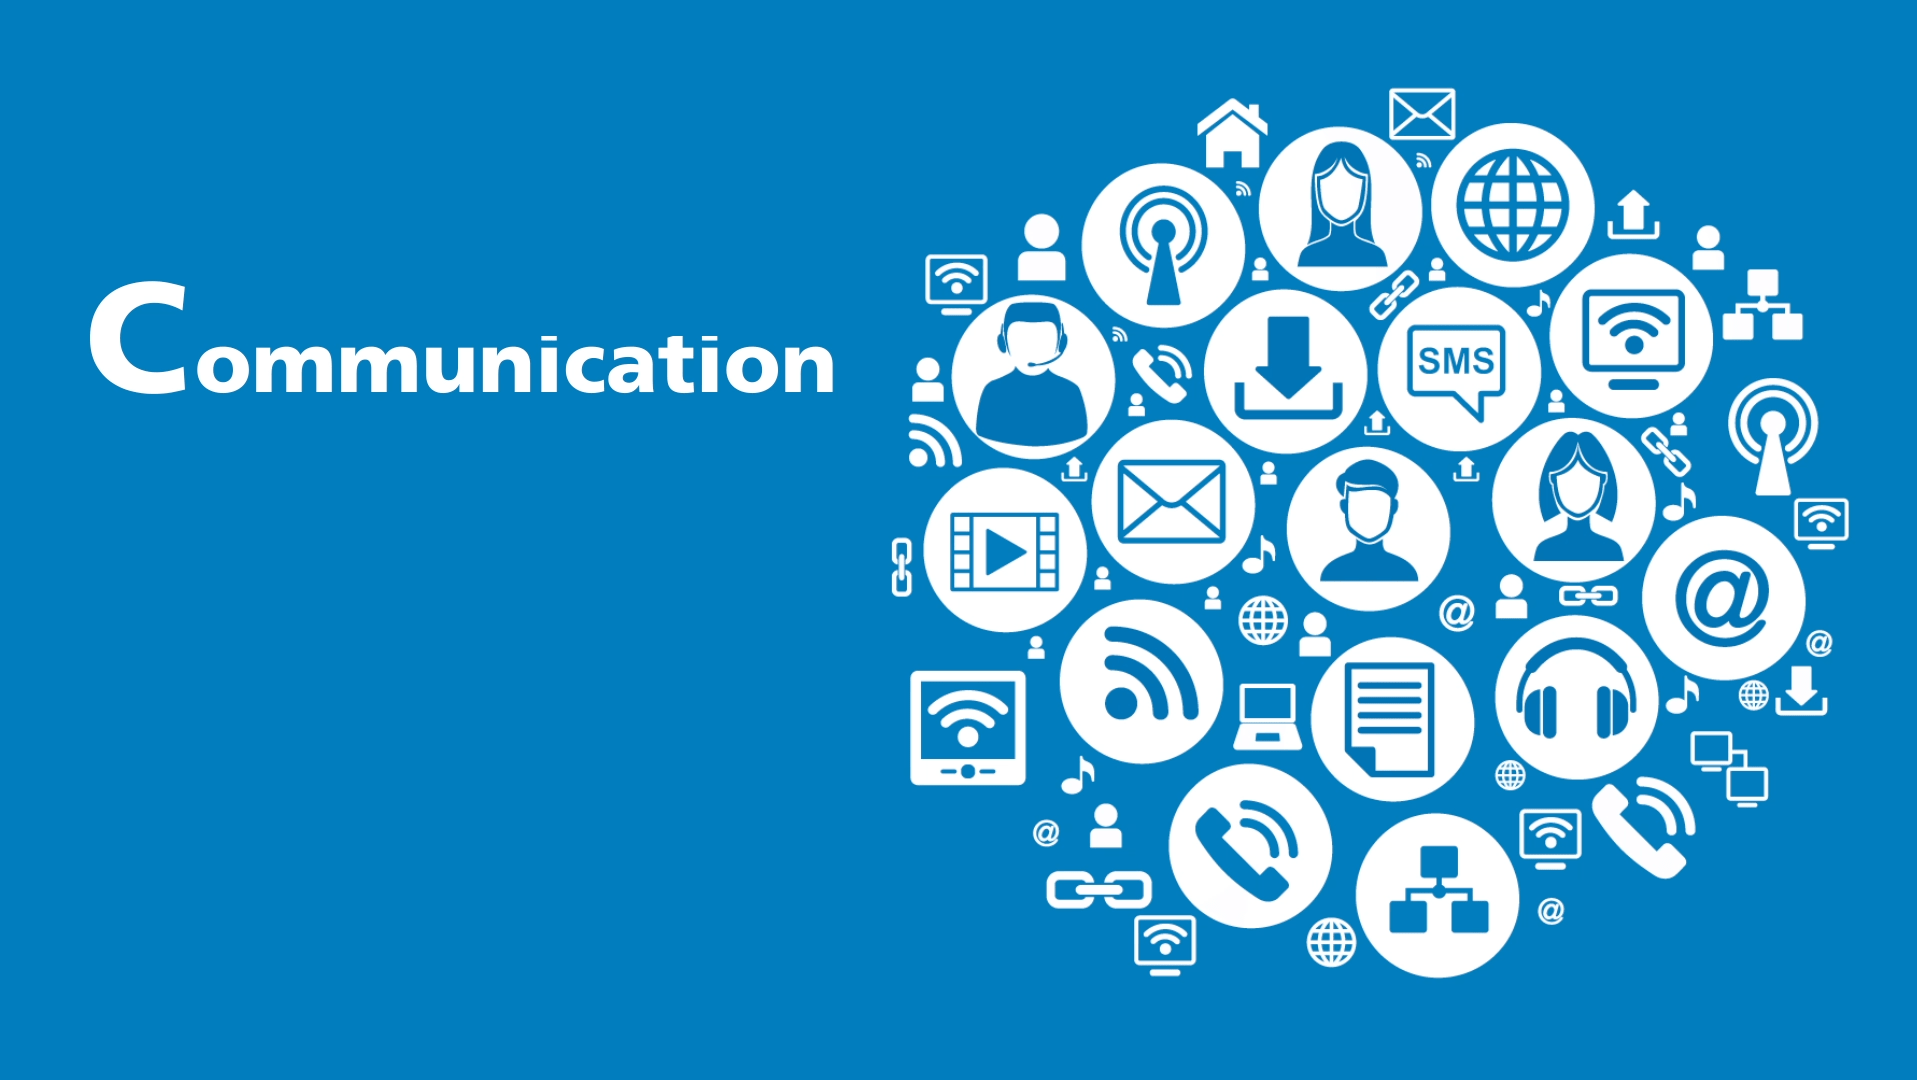 resume for marketing communication skills